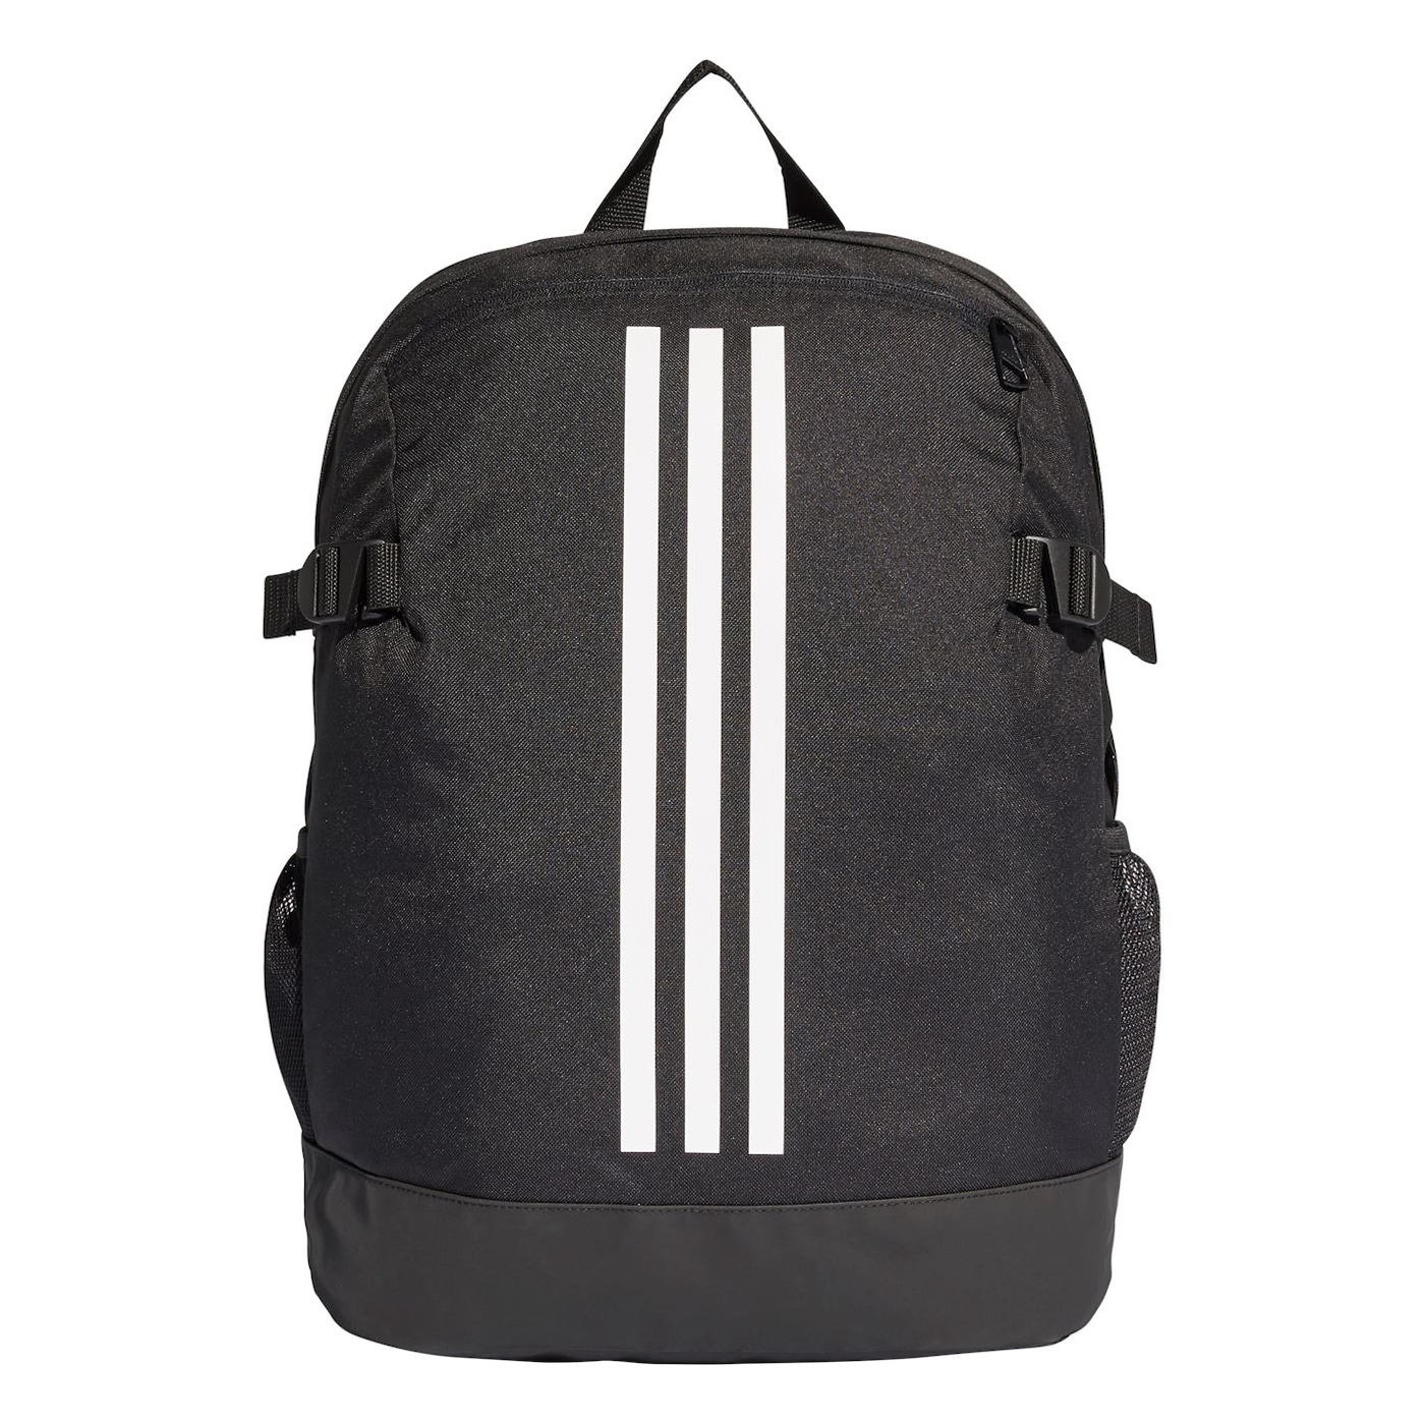 Adidas Power IV Medium Adults Backpack